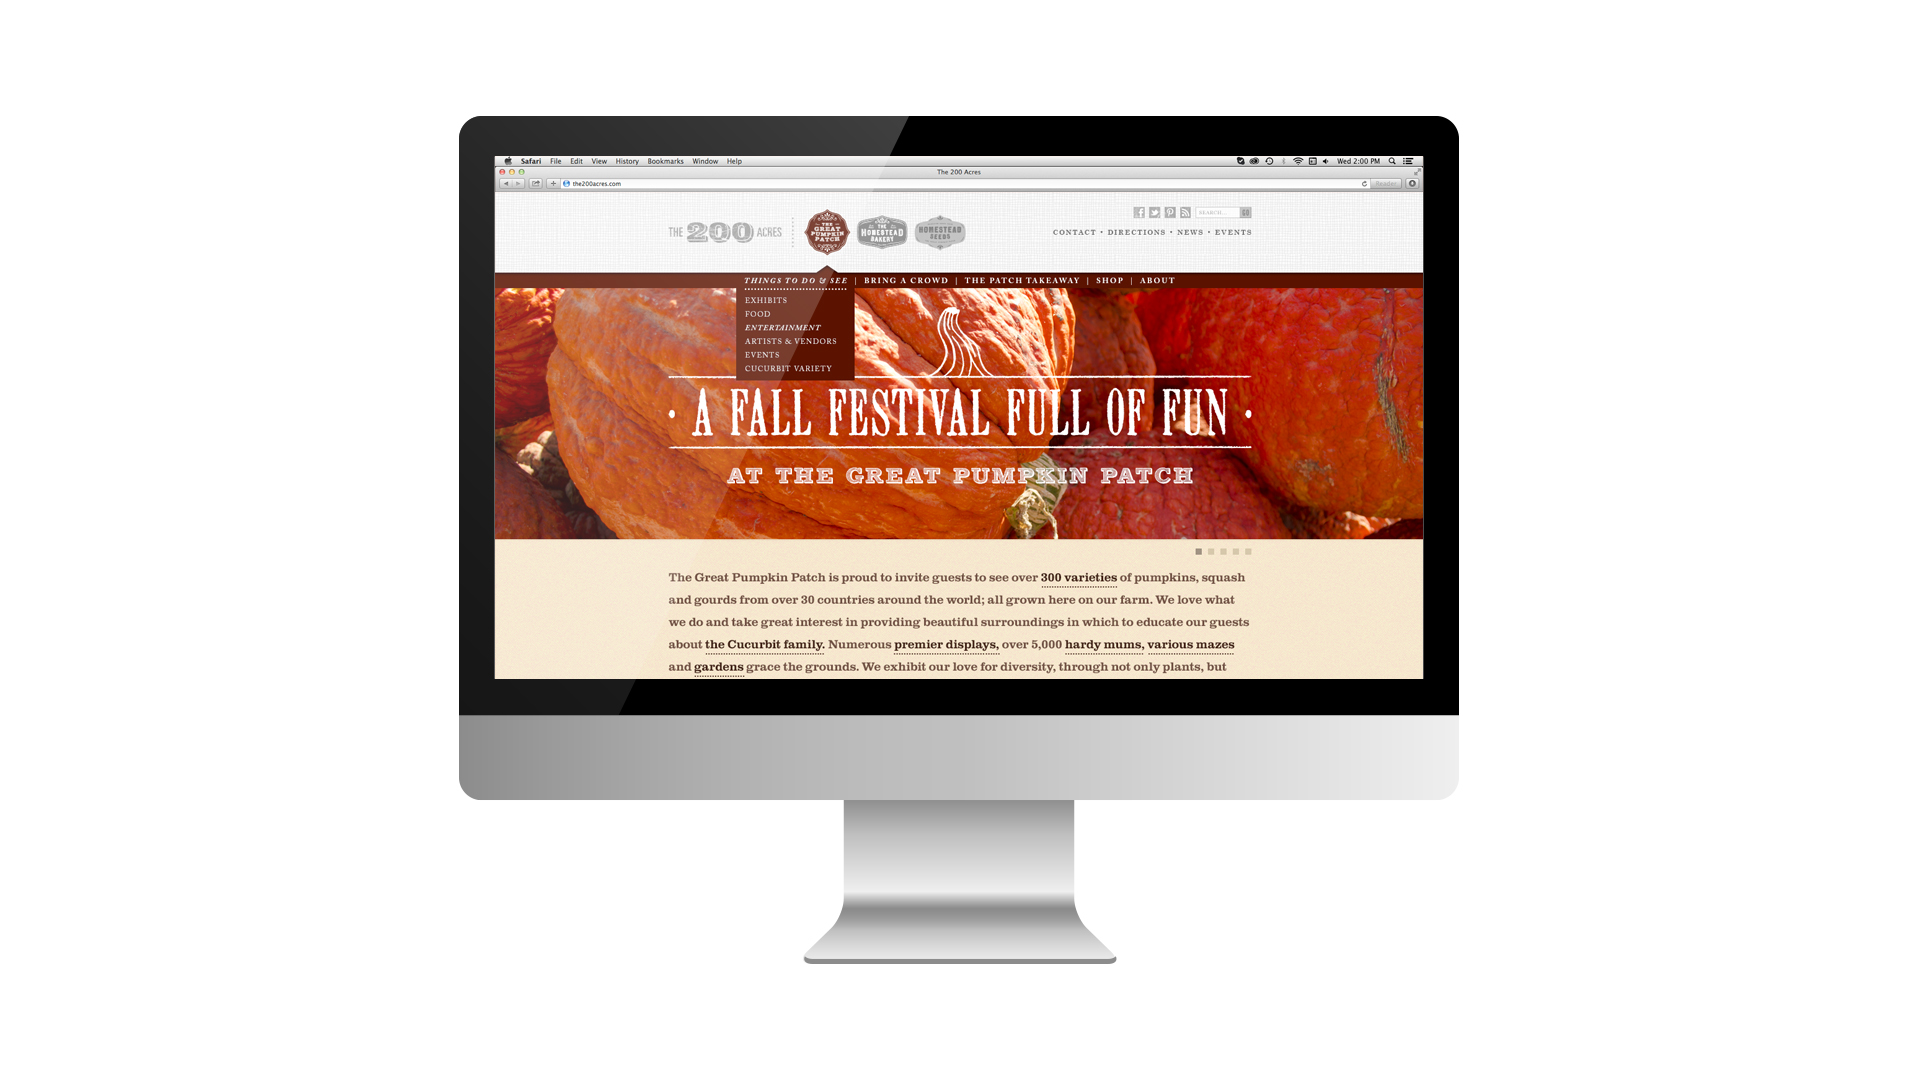 The Great Pumpkin Patch - Arthur, Illinois - Website